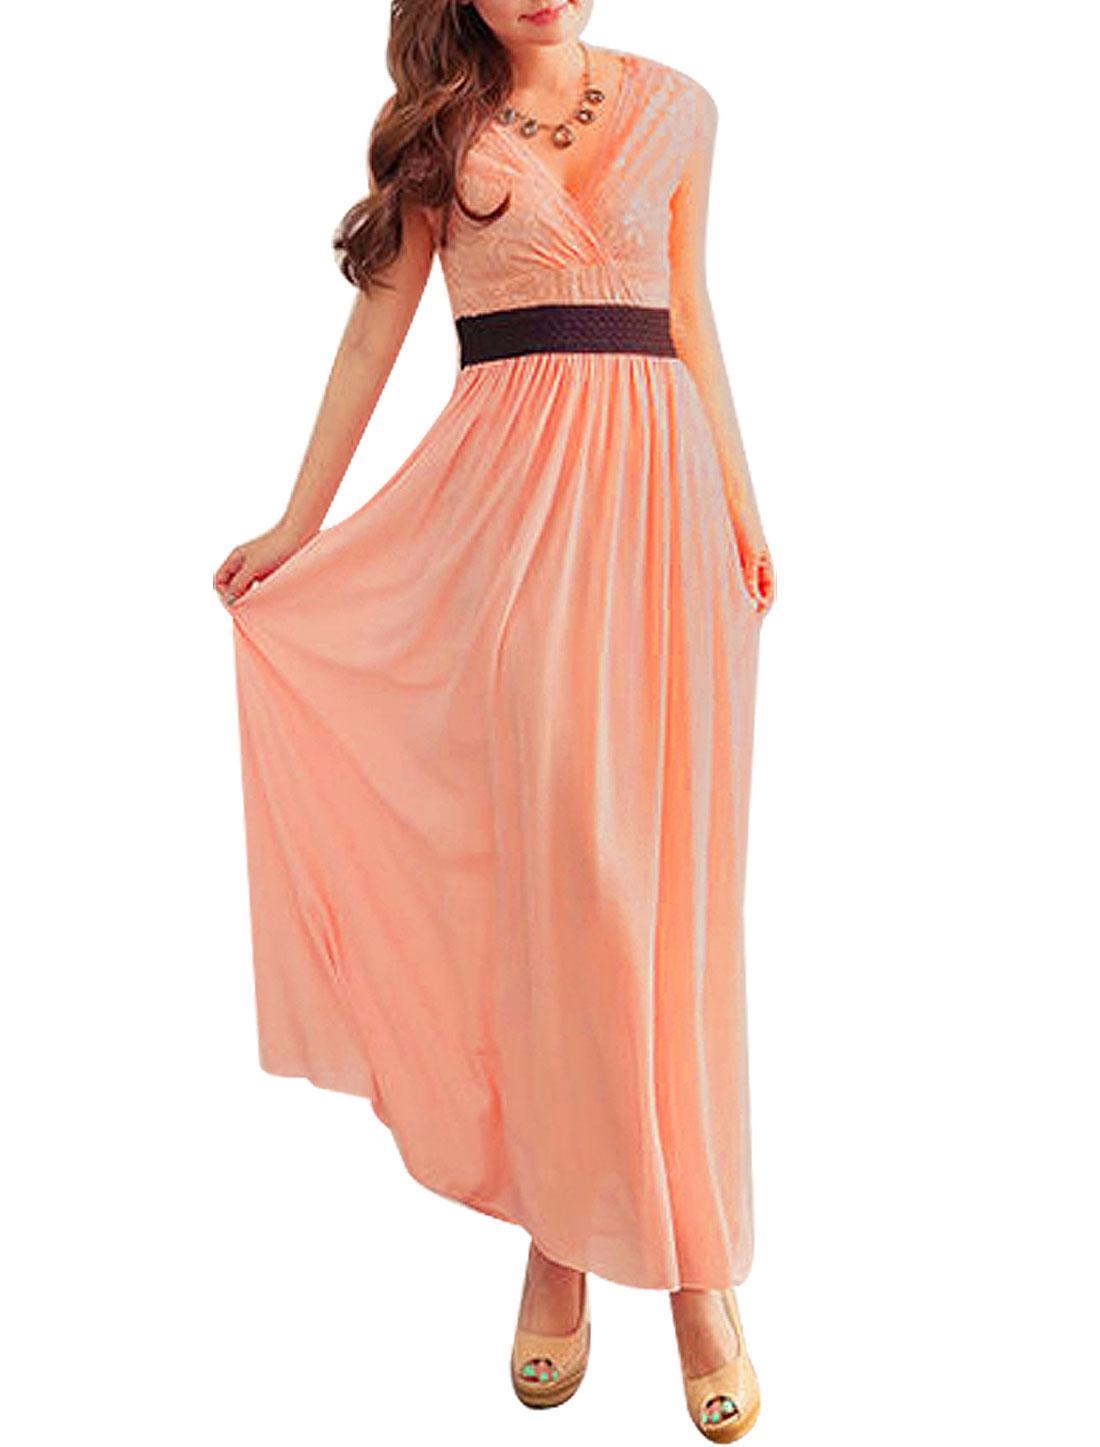 Women Fashion Lace Chiffon Splice Elastic Sheath Waist Maxi Dress Pink XS